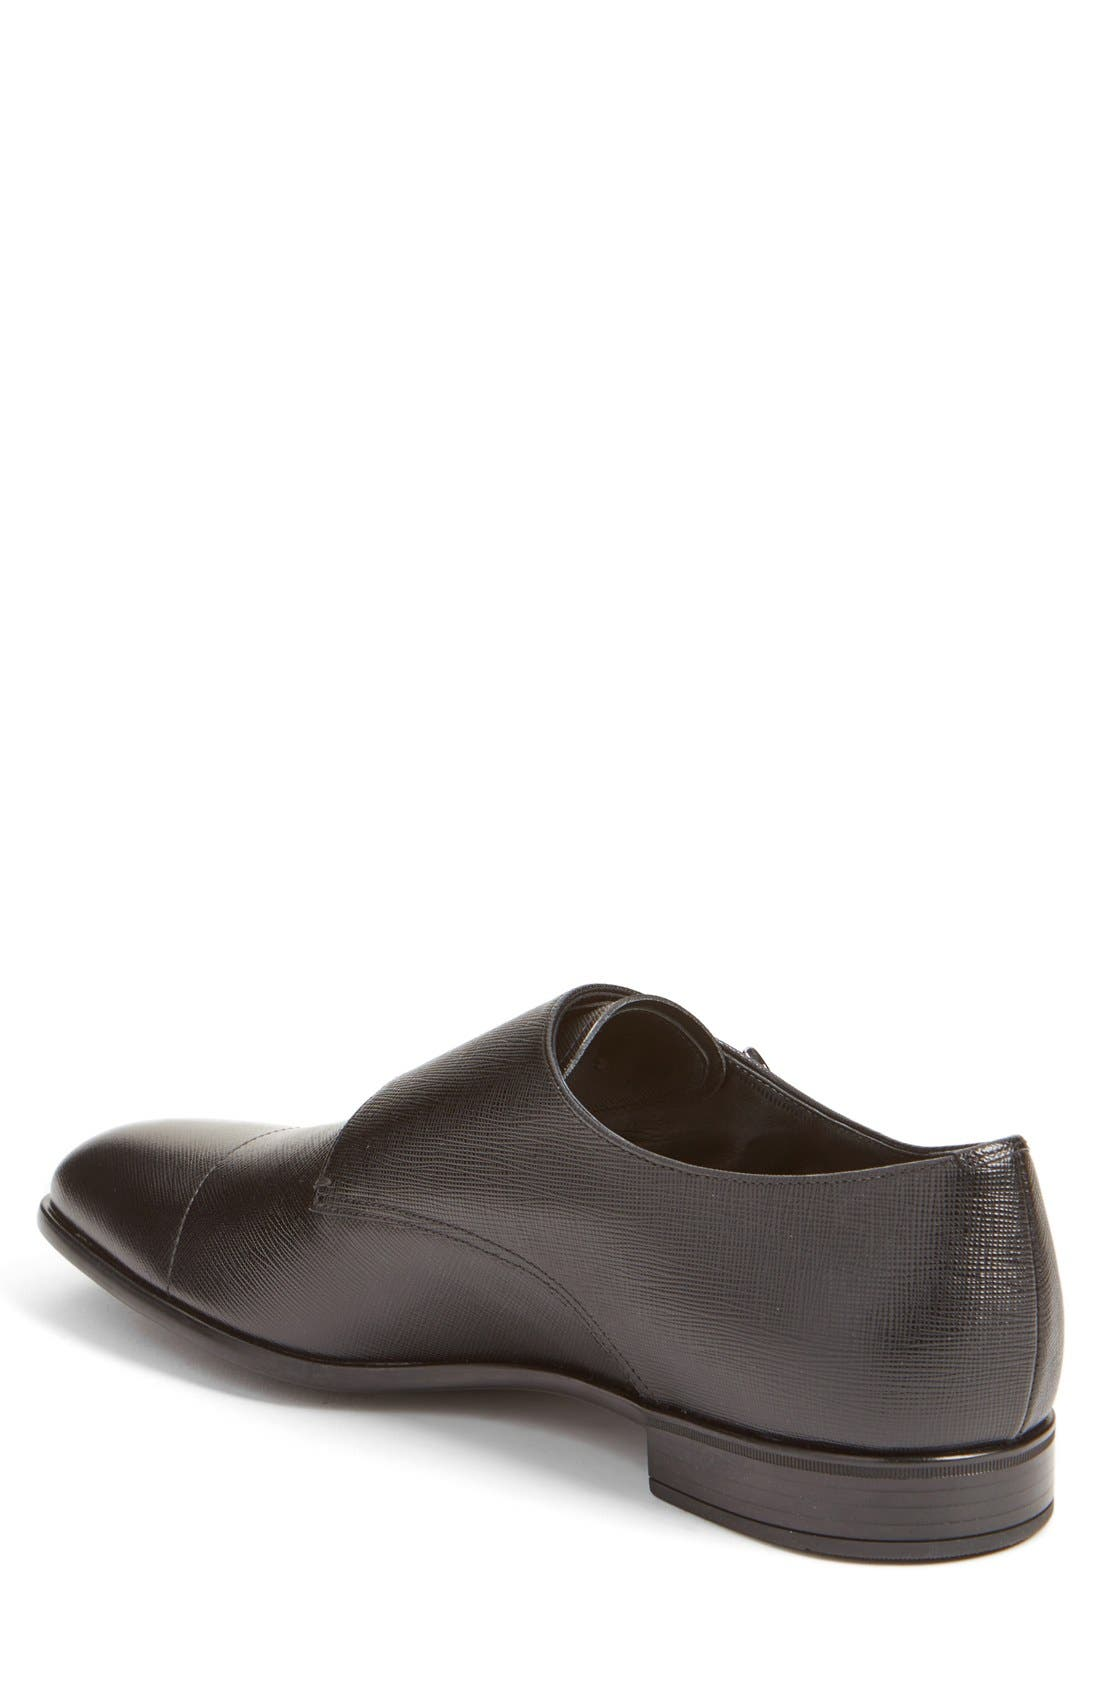 Double Monk Strap Shoe,                             Alternate thumbnail 3, color,                             Nero Leather